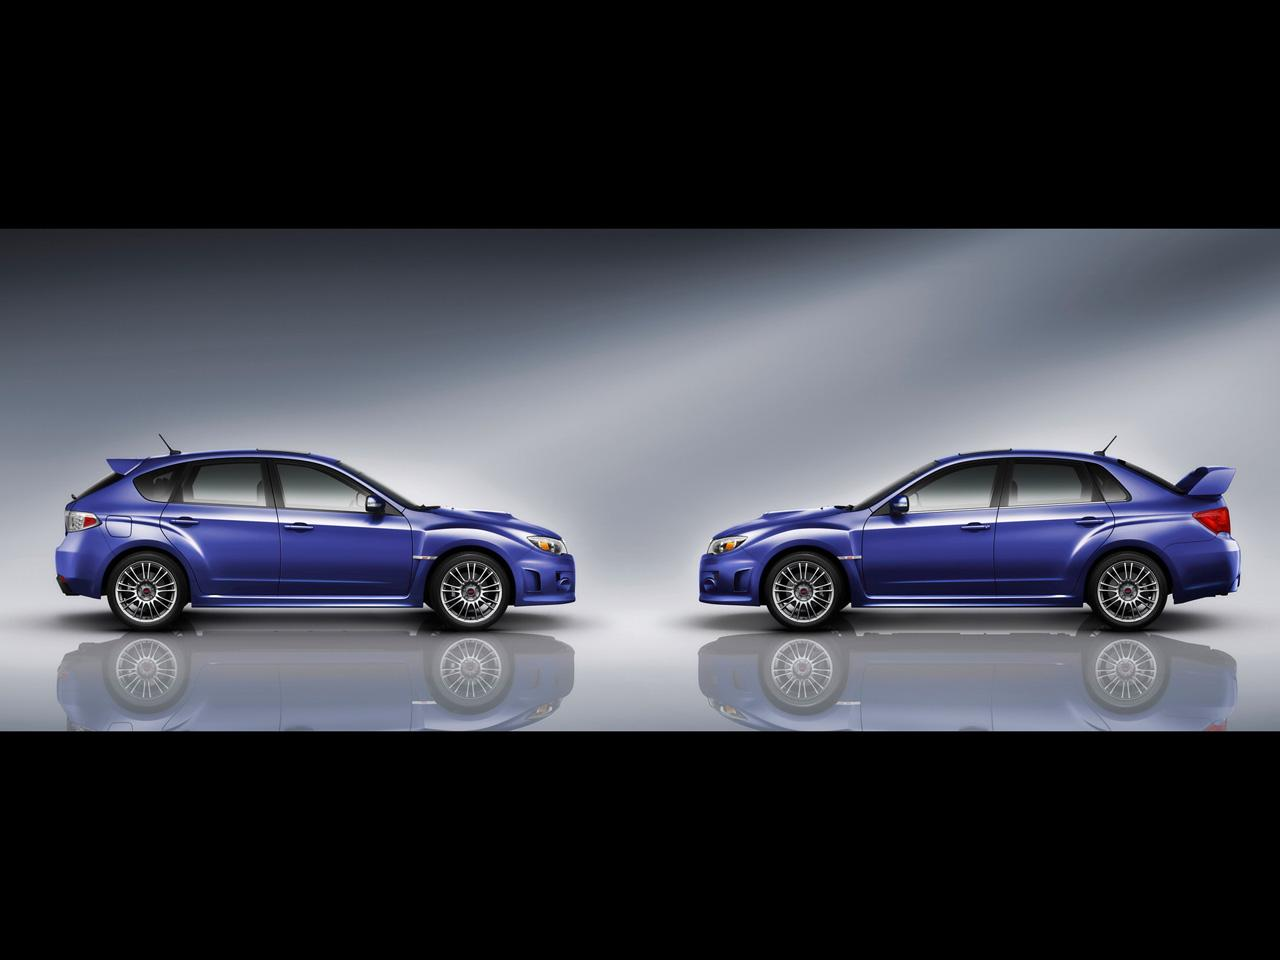 Wrx Vs Gti >> 2011 Subaru Impreza WRX STI Wallpapers by Cars-wallpapers.net